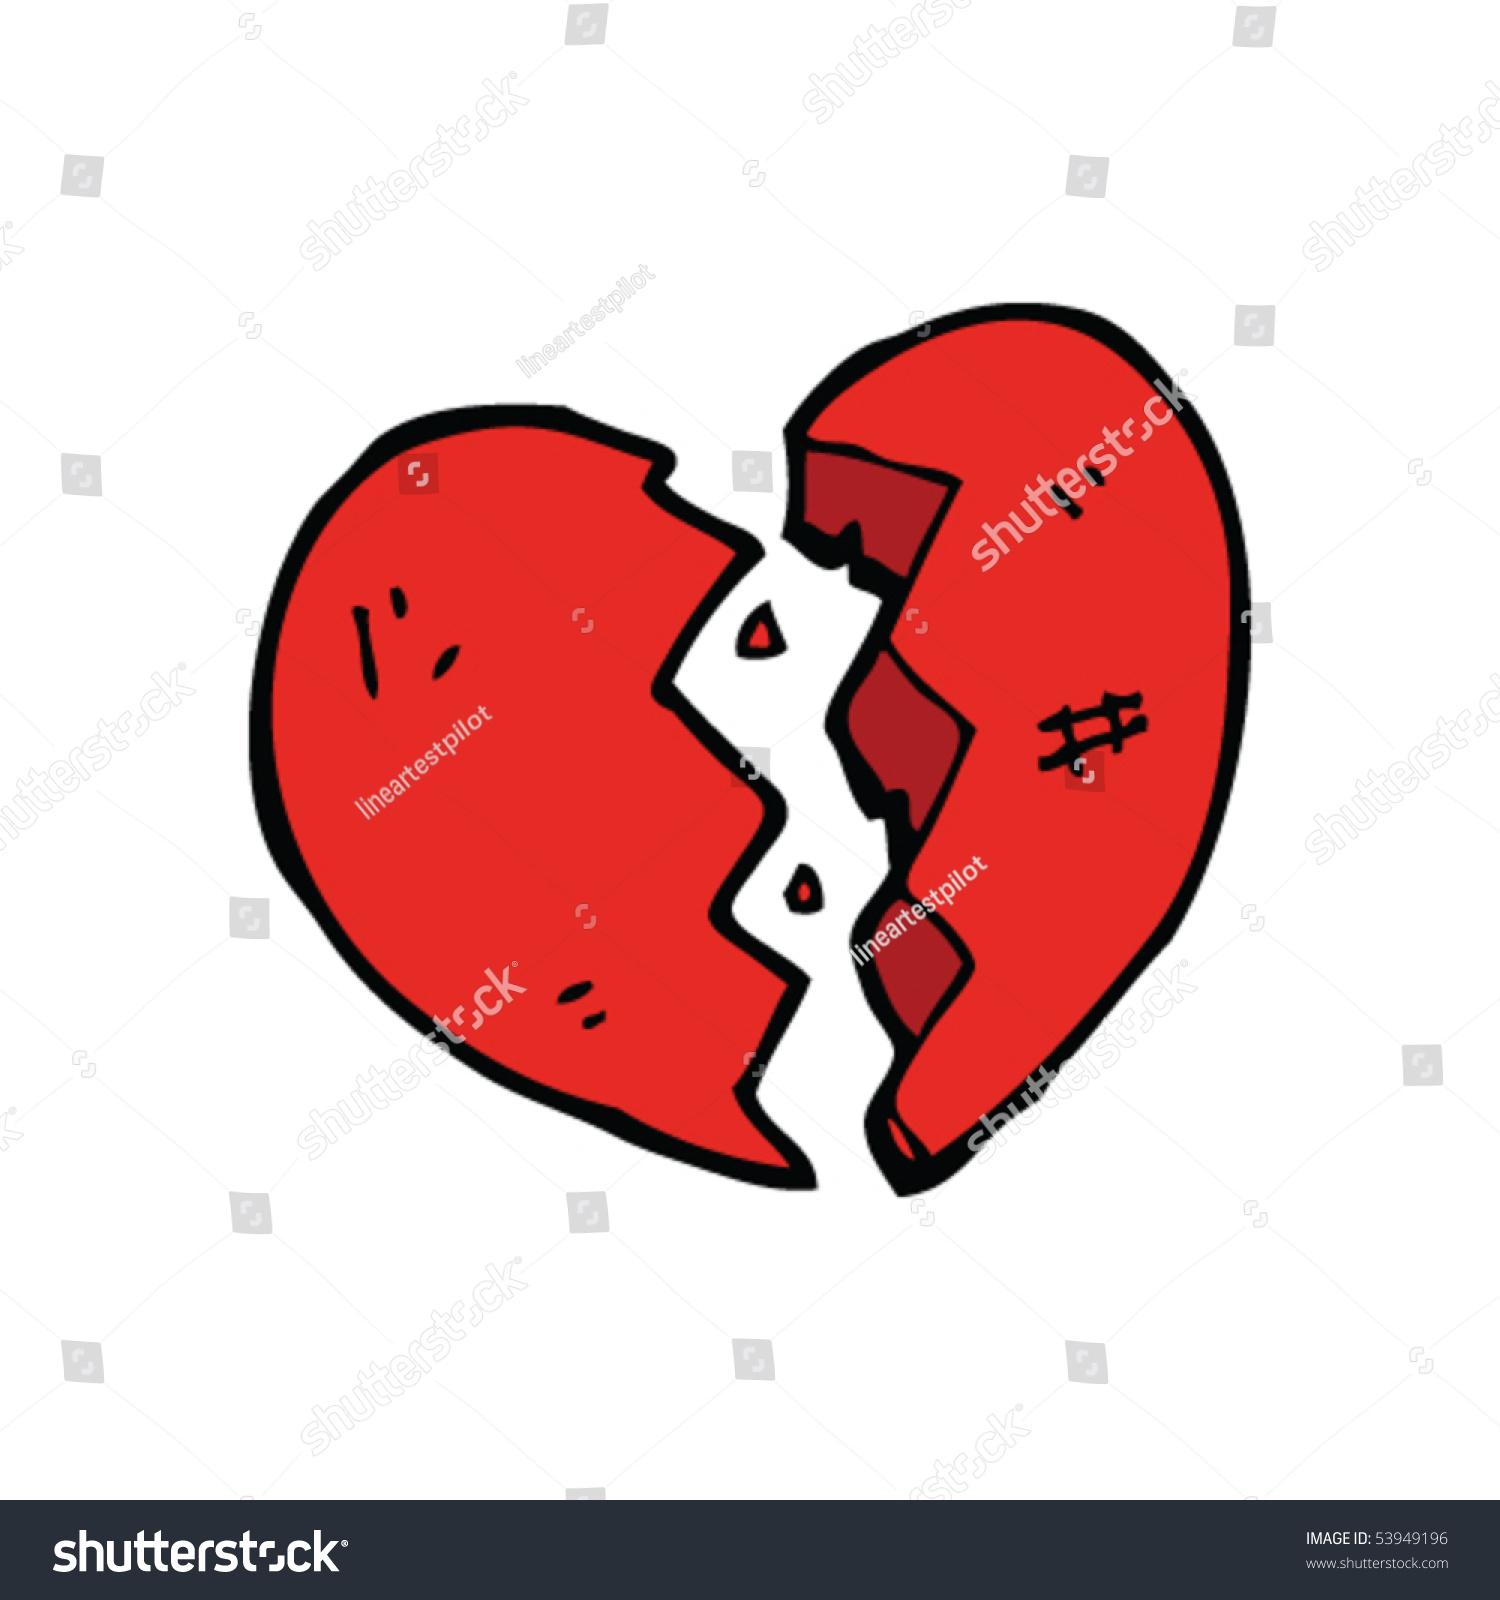 broken heart cartoon stock vector 2018 53949196 shutterstock rh shutterstock com cartoon broken heart images cartoon broken heart video